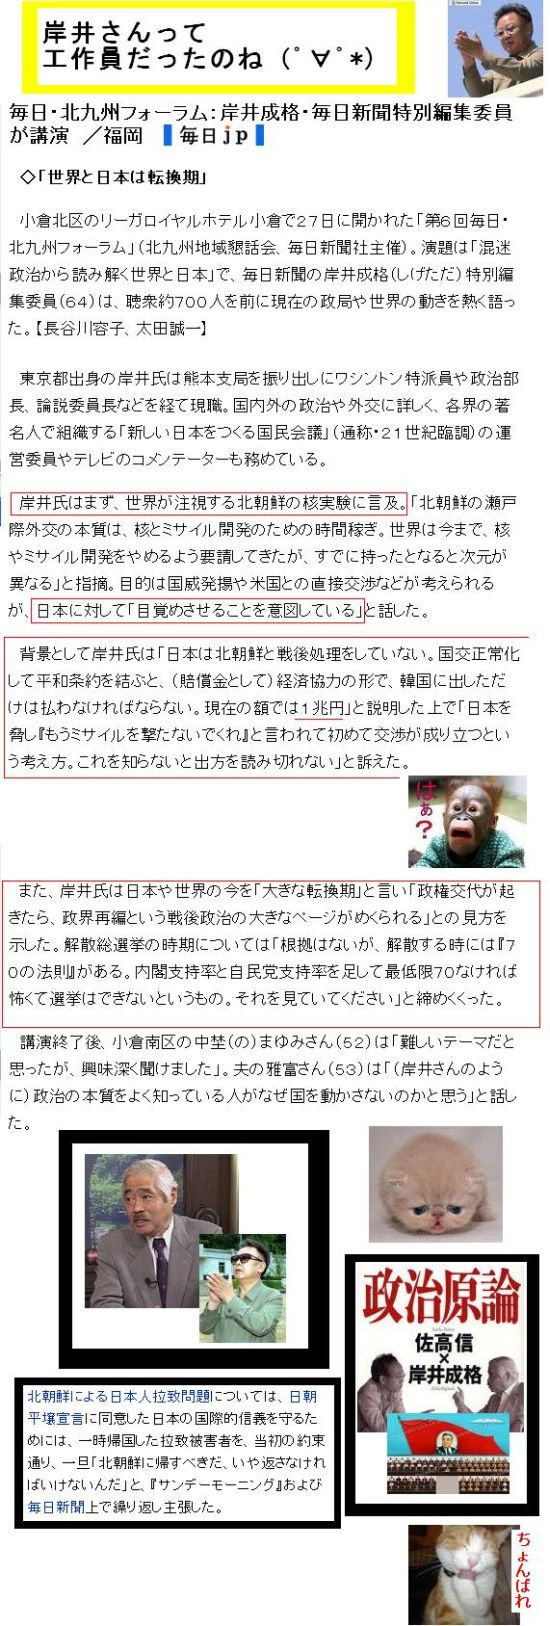 kishiikousakuindaro2.jpg